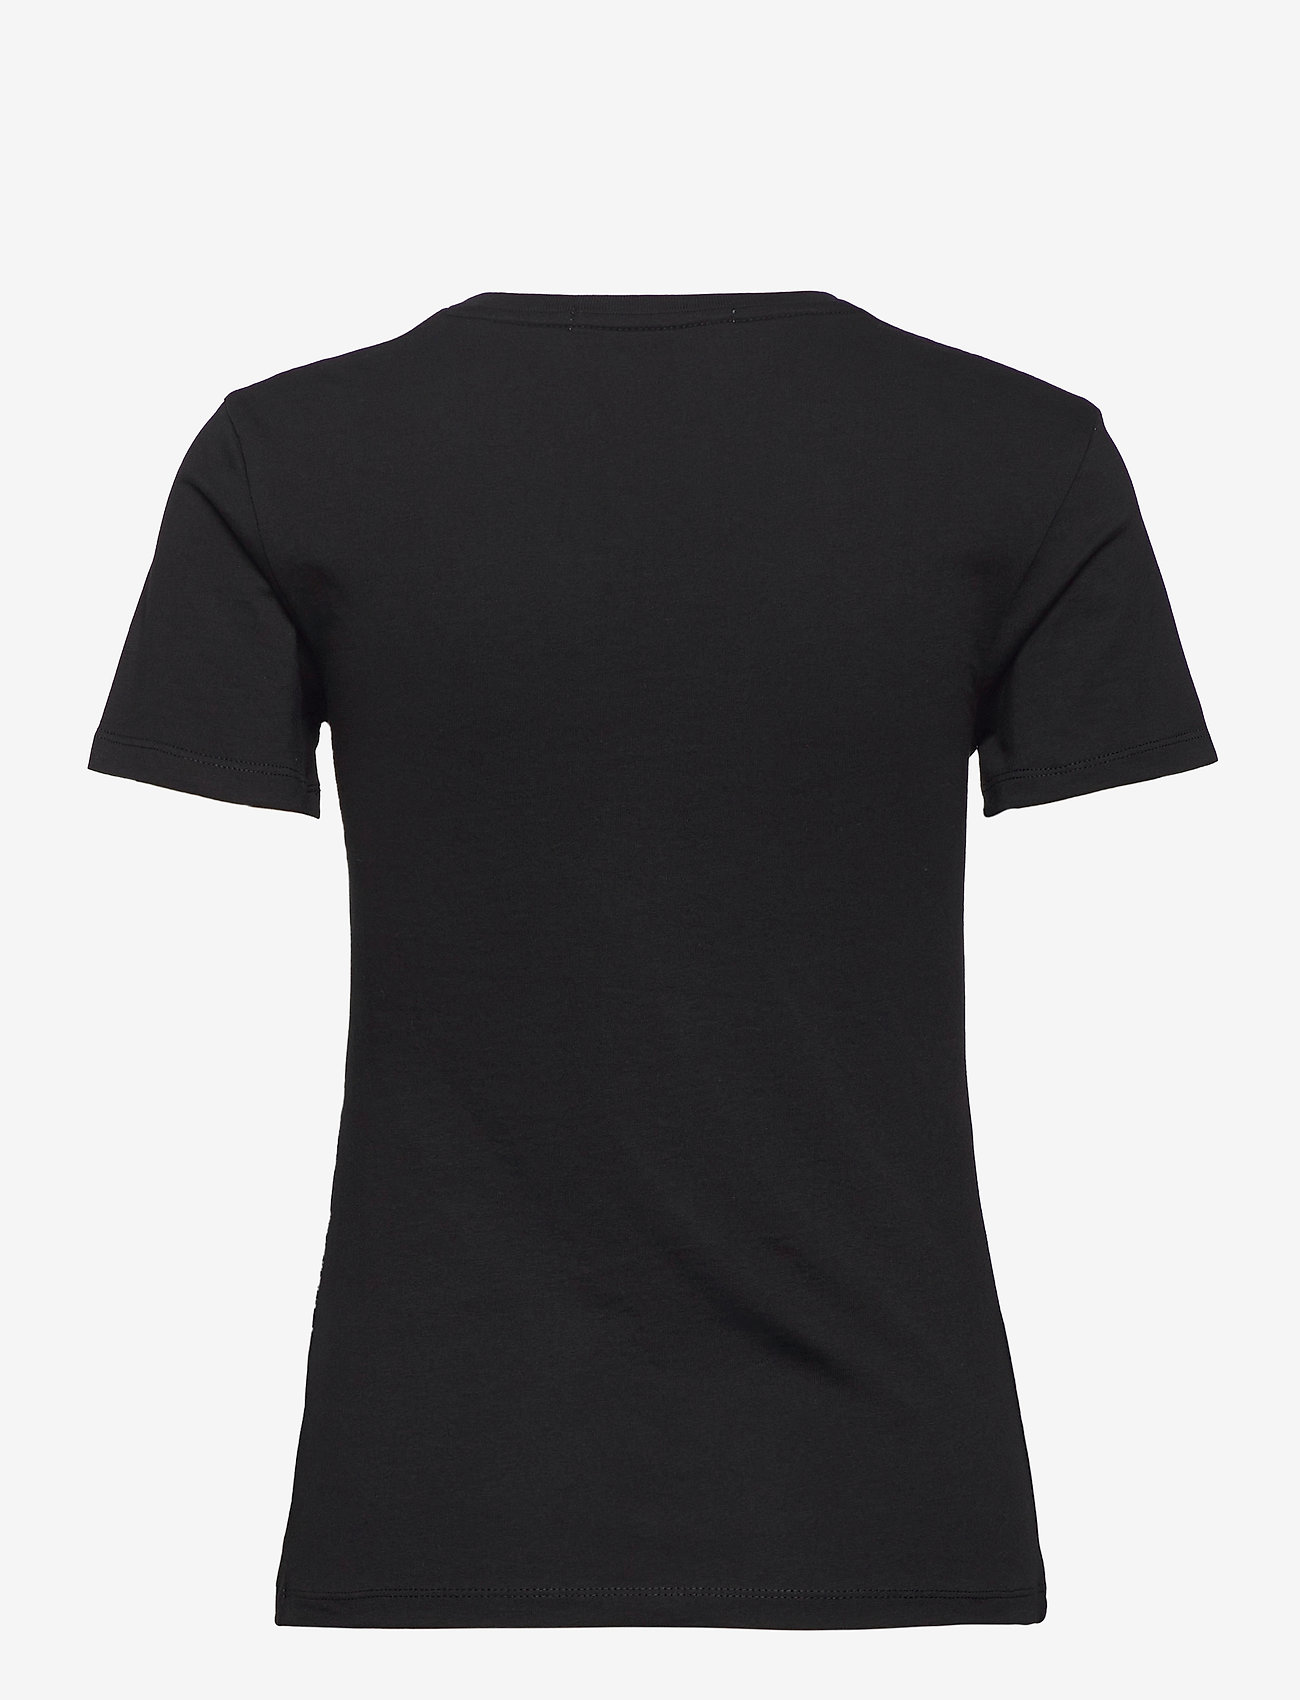 Calvin Klein Jeans - GOLD MONOGRAM TEE - t-shirts - ck black - 1